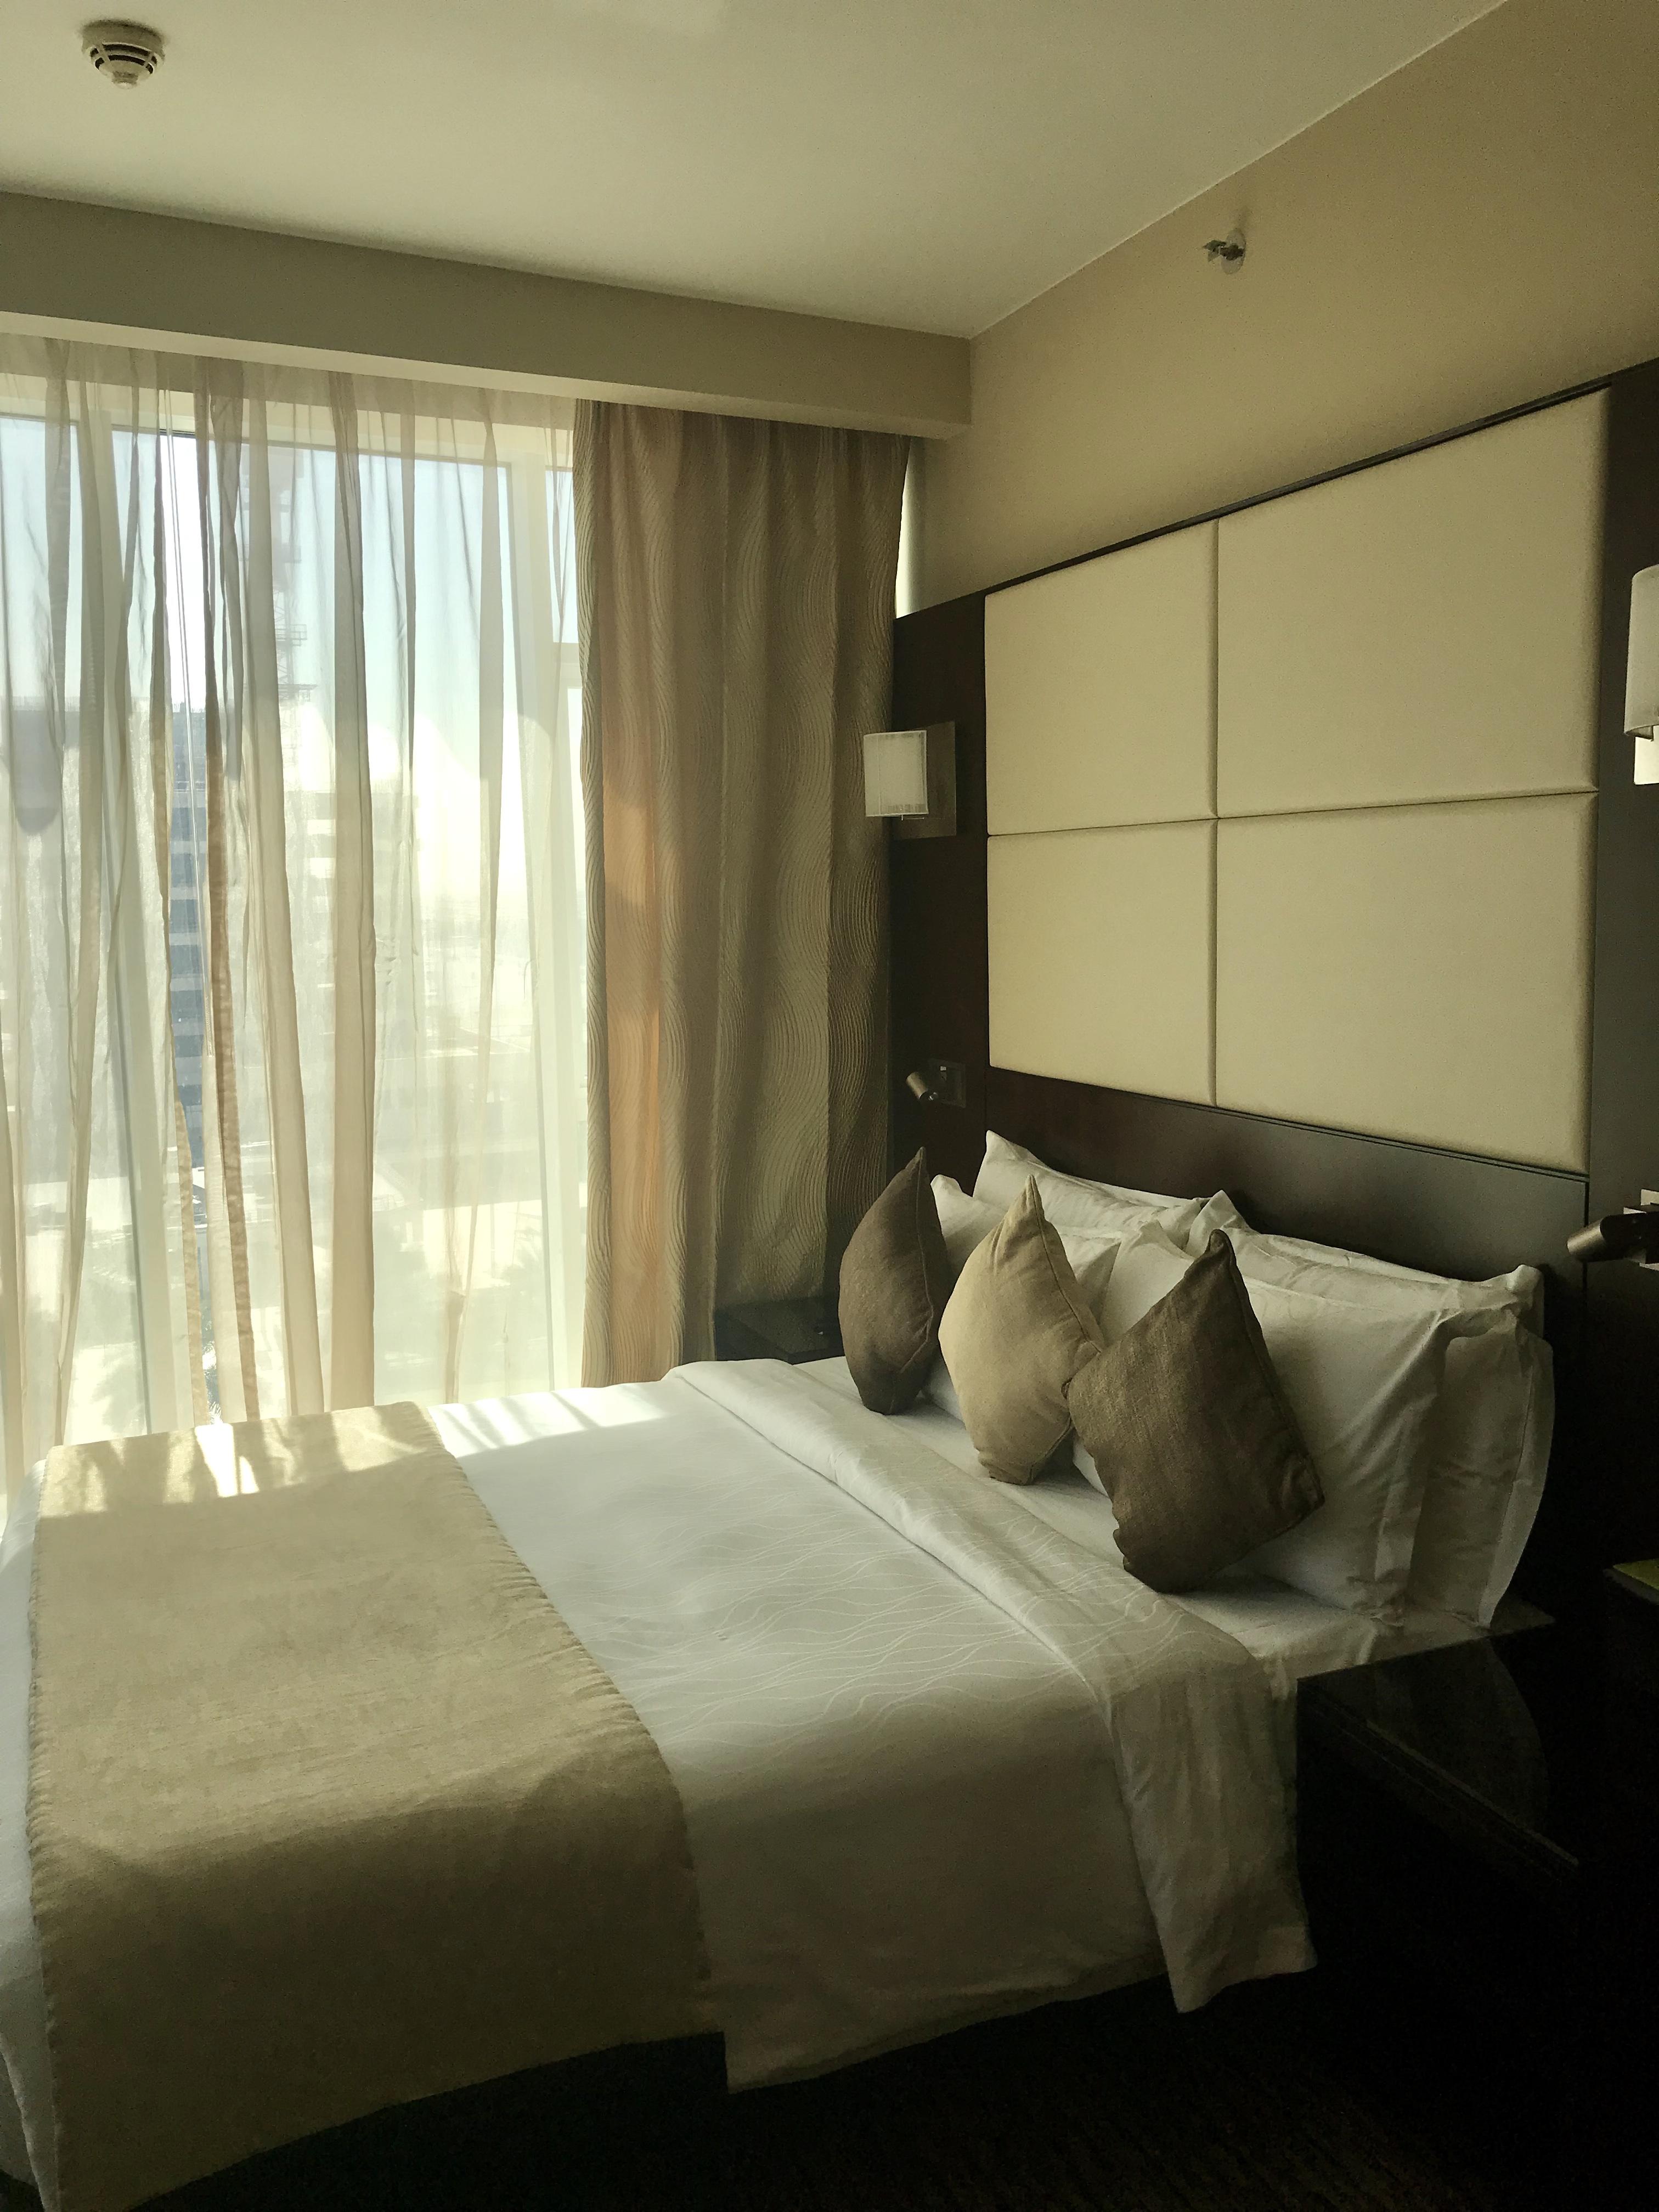 Mövenpick Hotel Jumeirah Lake Towers